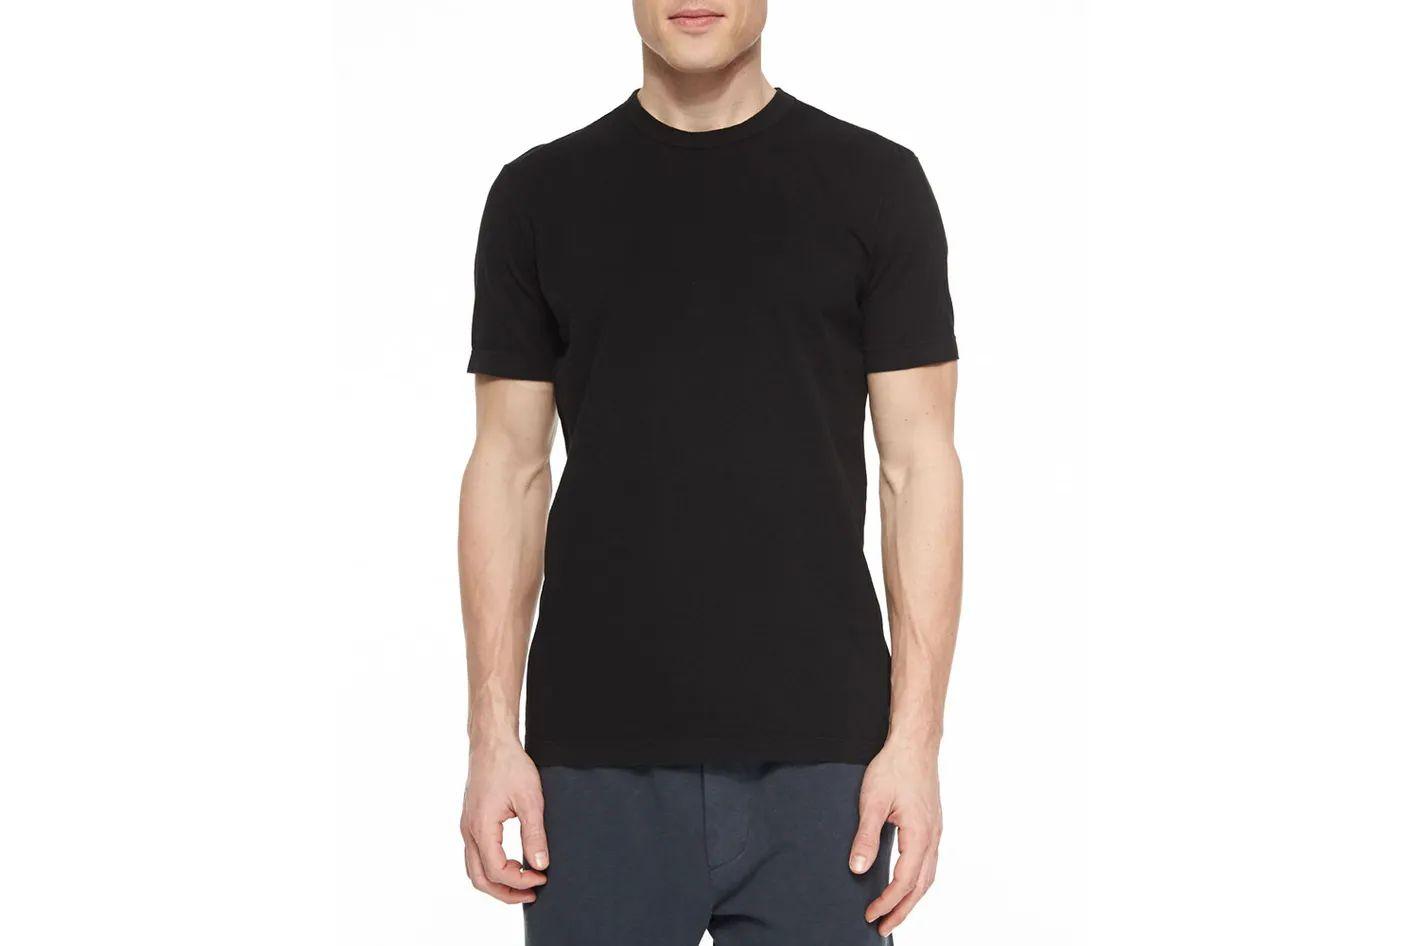 Black t shirt black -  Black T Shirts I Love Download